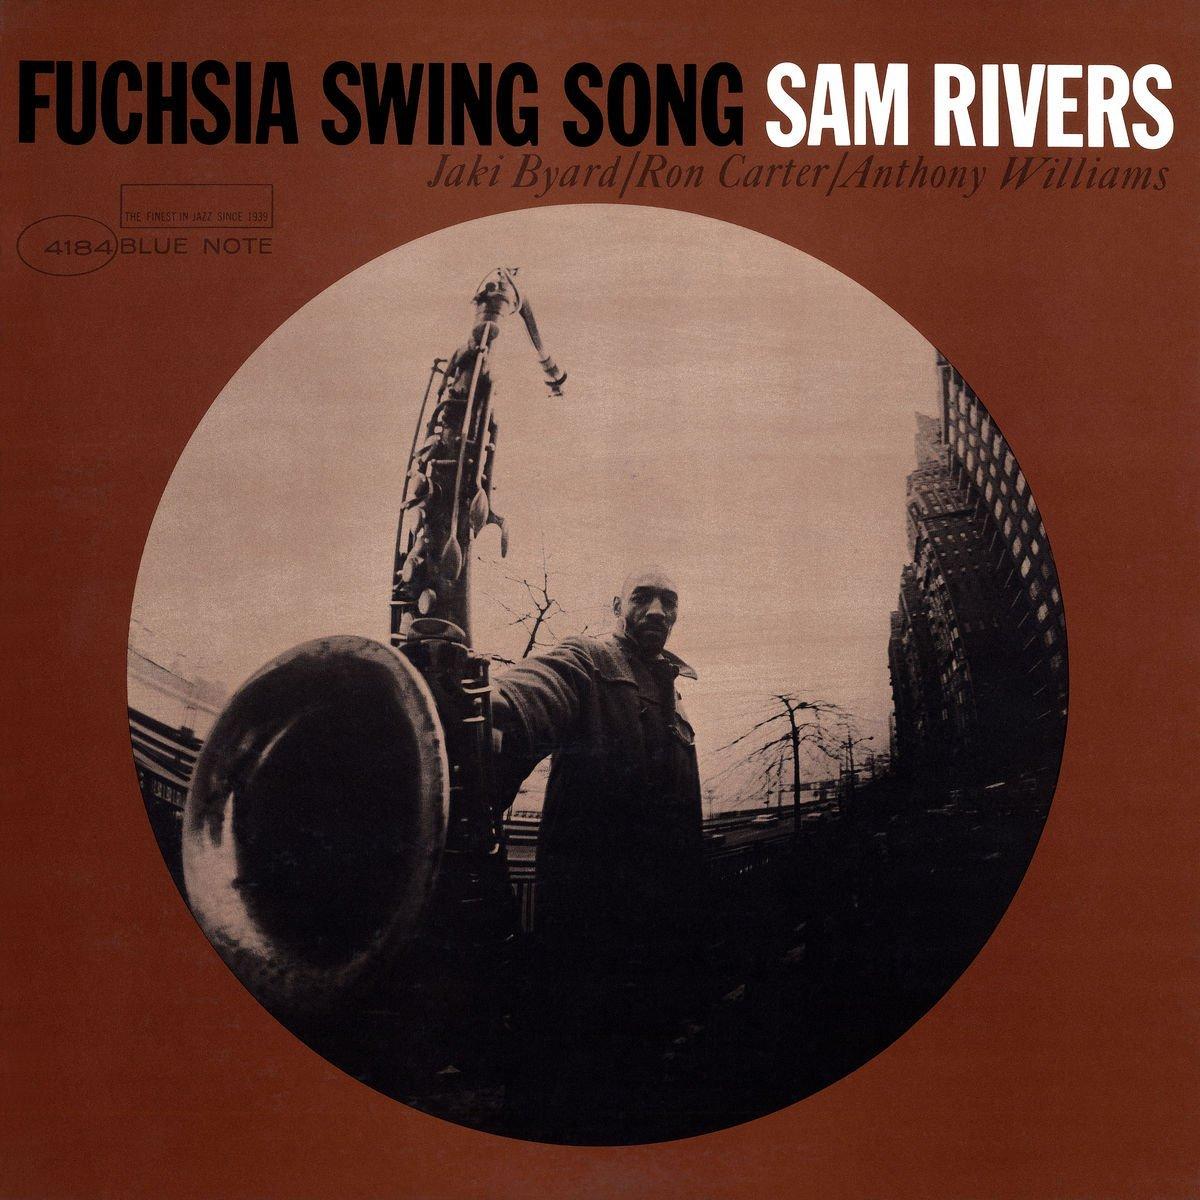 Fuchsia Swing Song - Vinyl